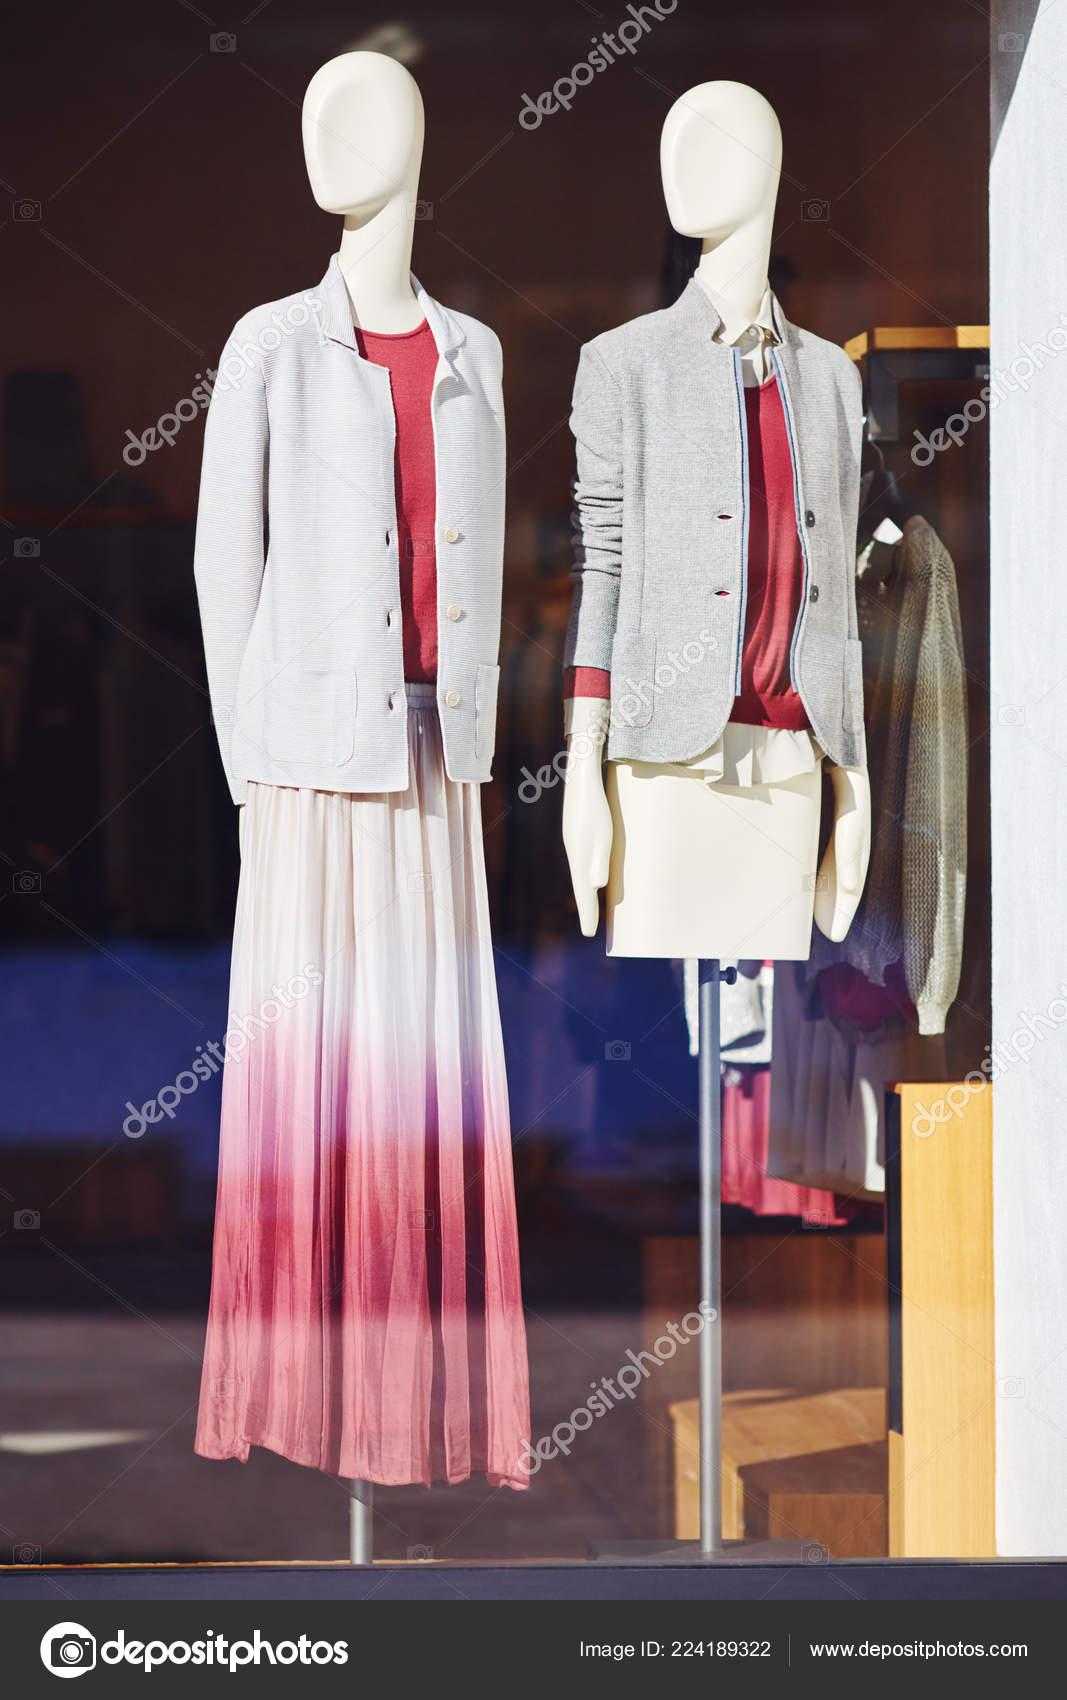 673d49e3ccc Maniquíes Tienda Escaparate Tienda Ropa Casual Para Mujer Centro Comercial  — Foto de Stock